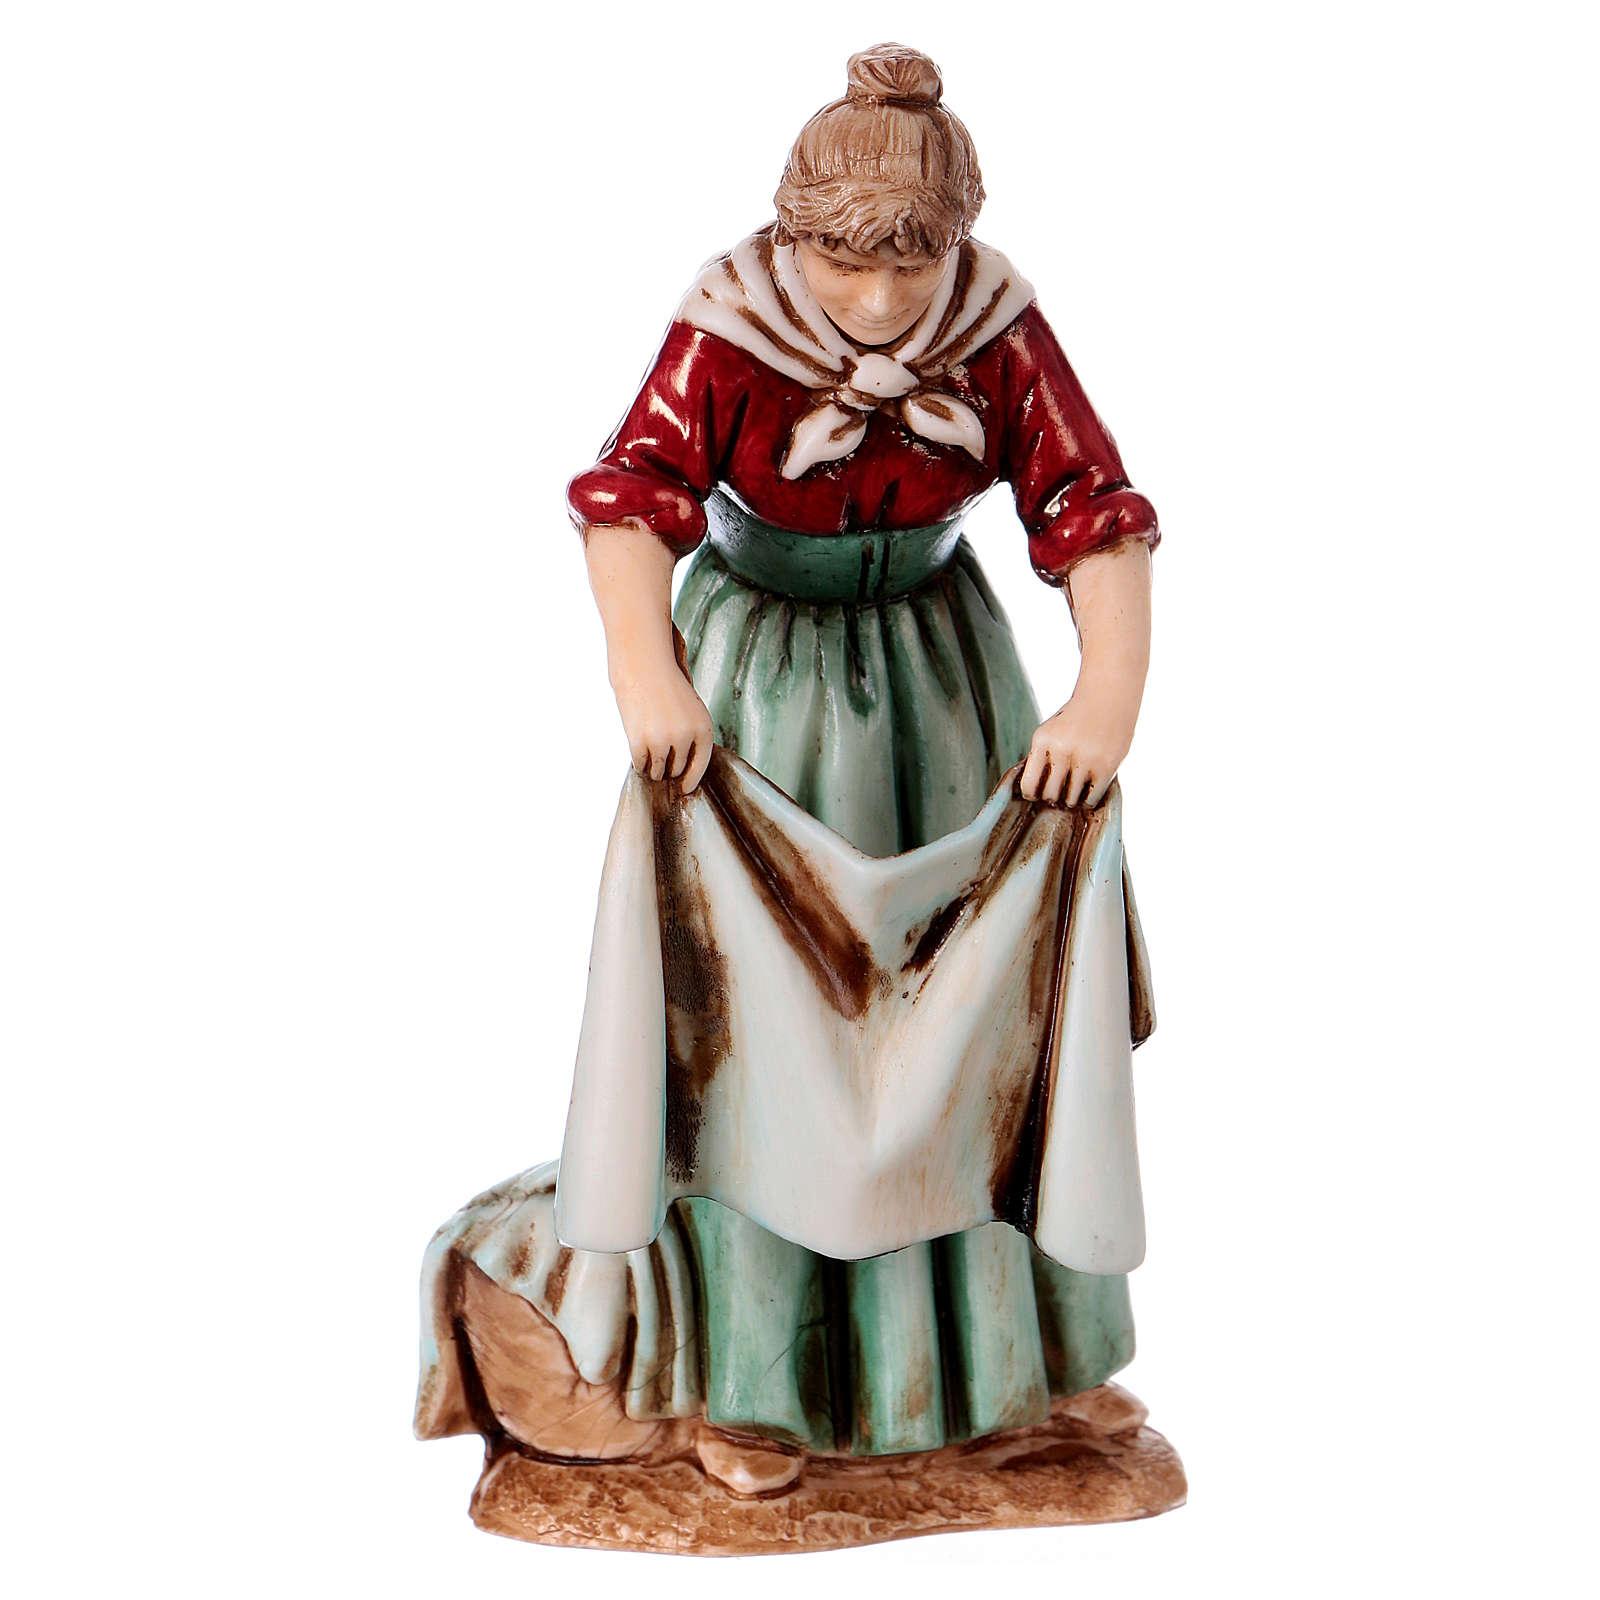 Personajes asomados 3 figuras belén 10 cm de altura media Moranduzzo estilo 700 4